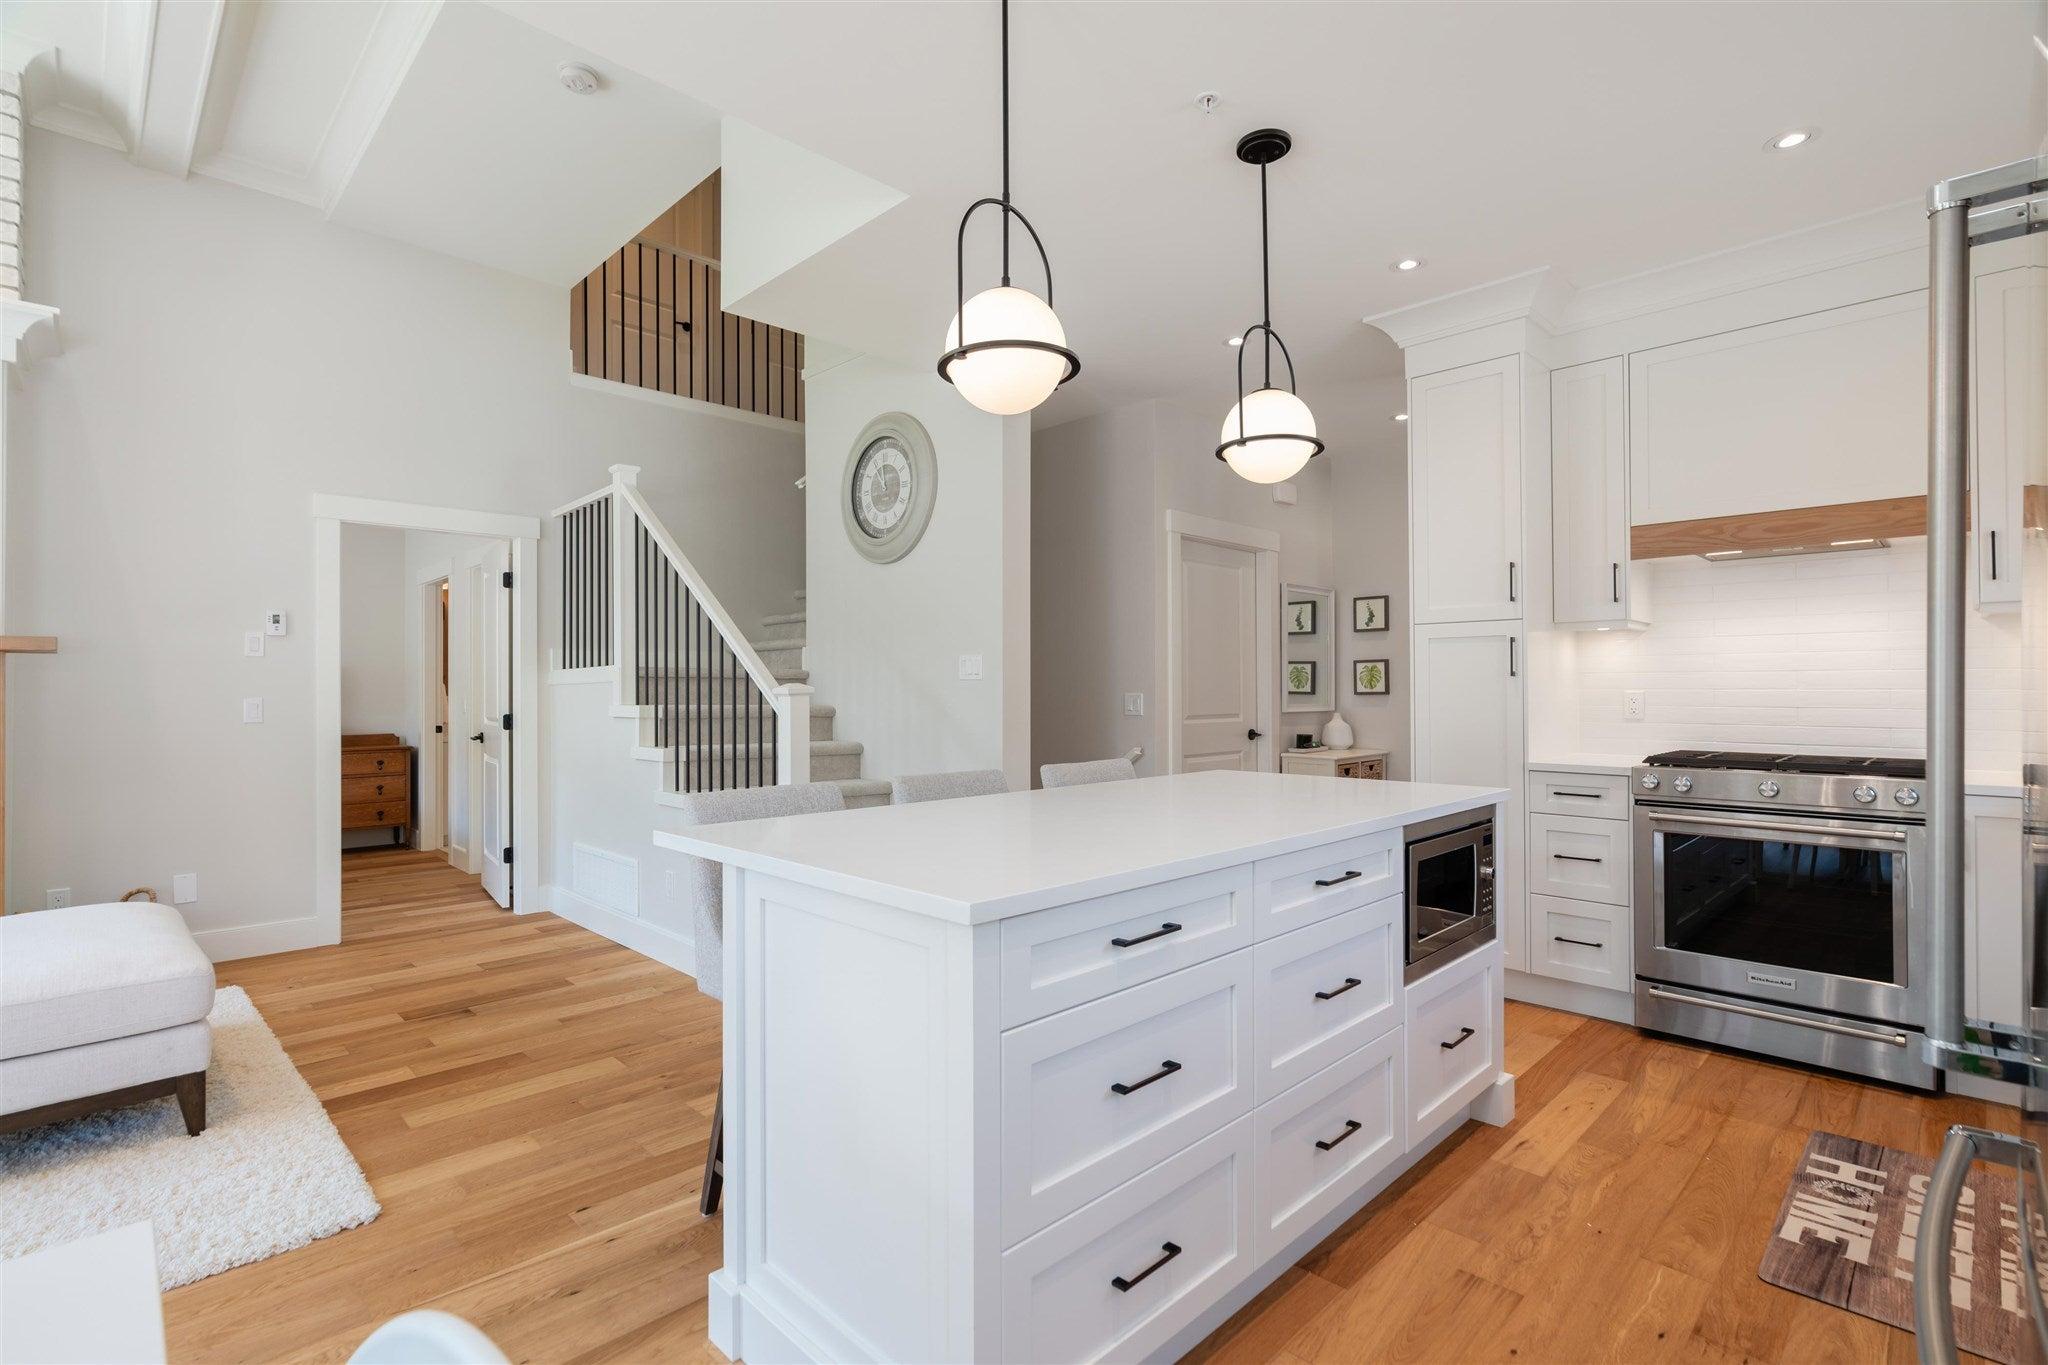 40 21858 47B AVENUE - Murrayville Townhouse for sale, 4 Bedrooms (R2603956) - #13